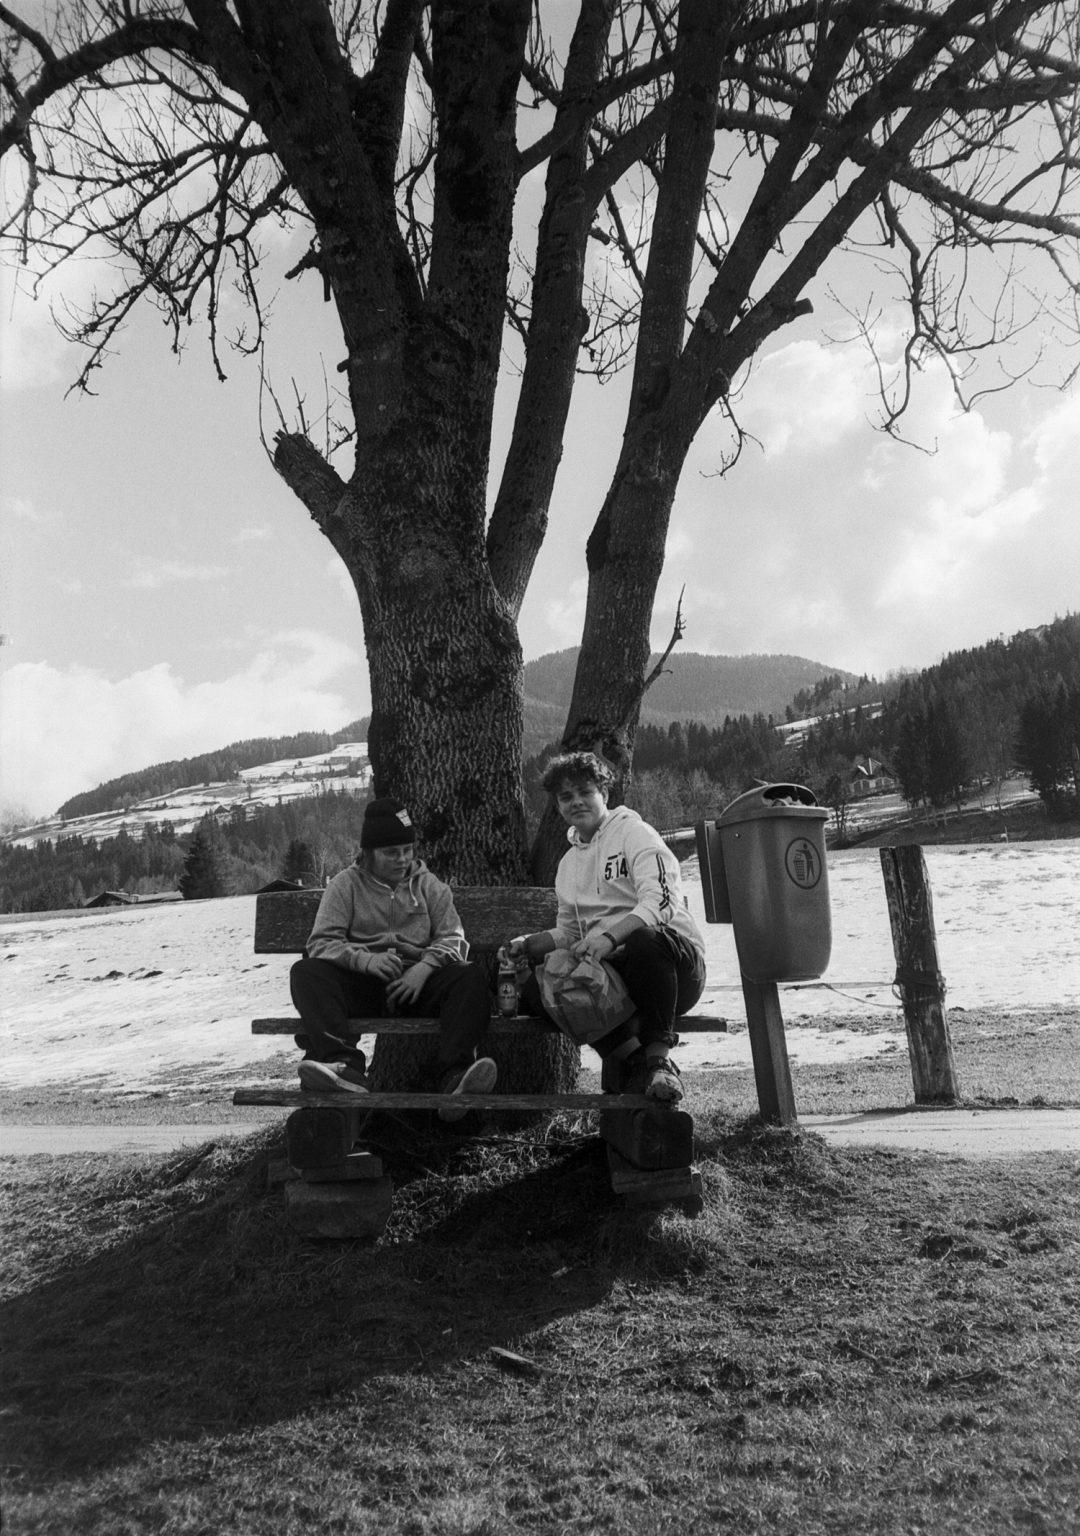 #083 Jake and Jesse Mackie takeout, Weissenbach im Ennstal